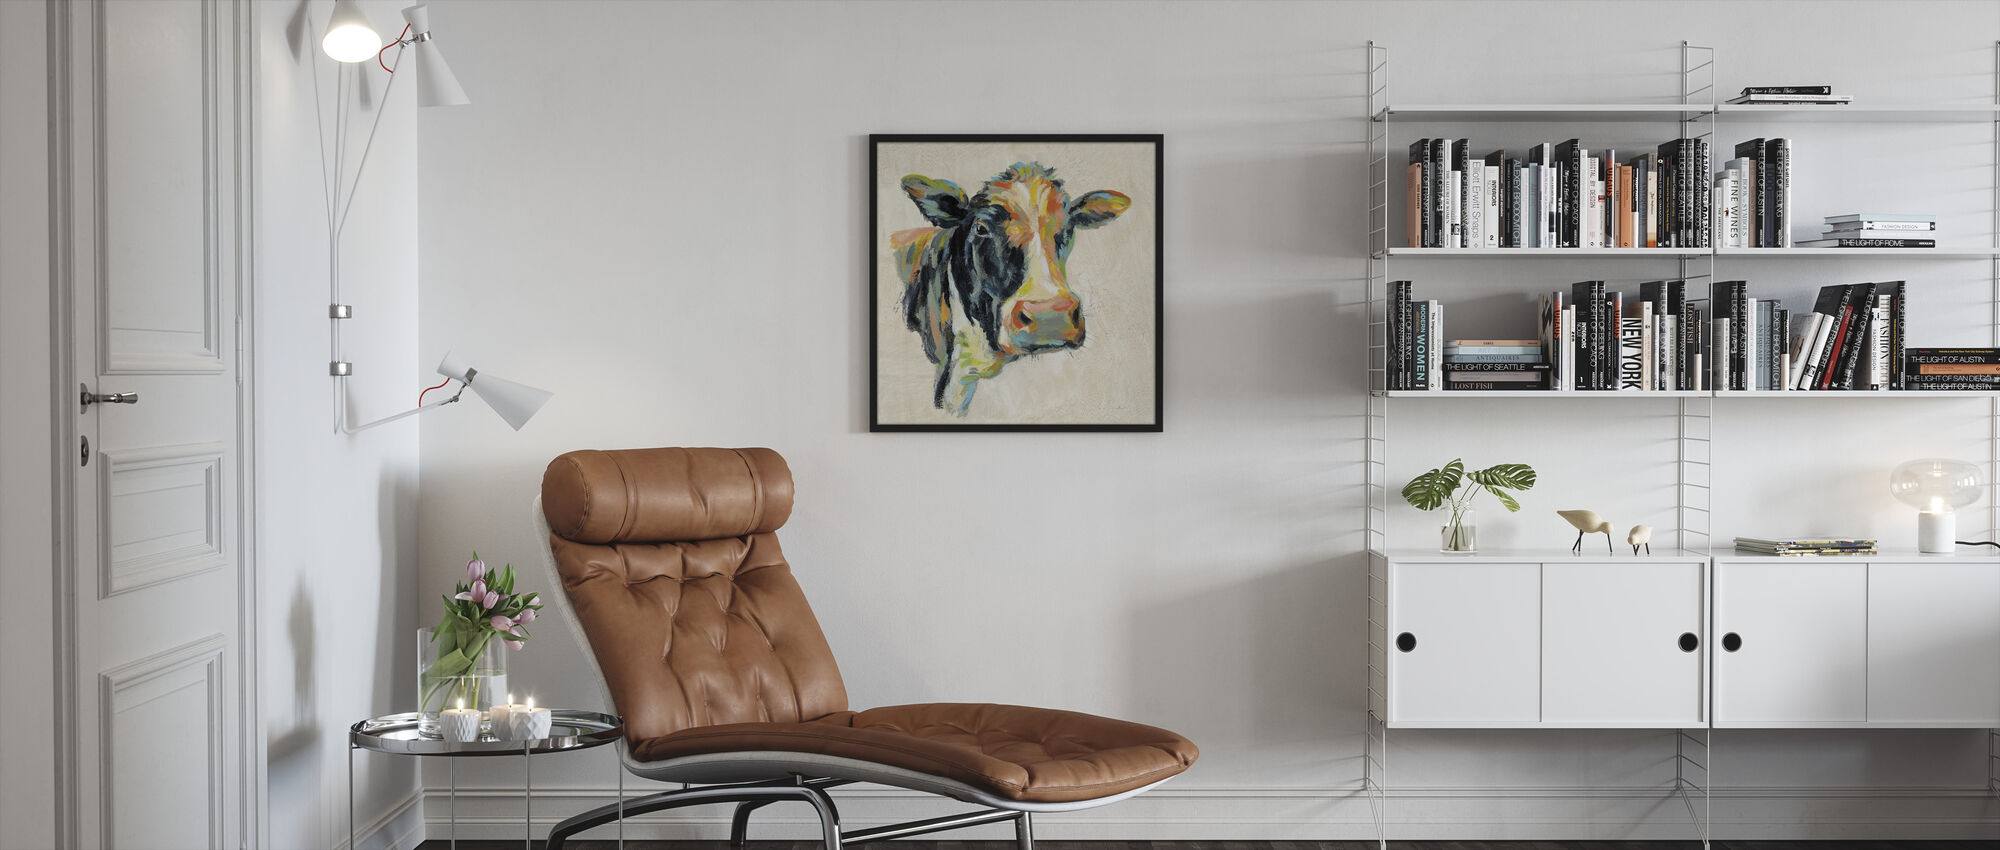 Expressionistic Cow I - Framed print - Living Room